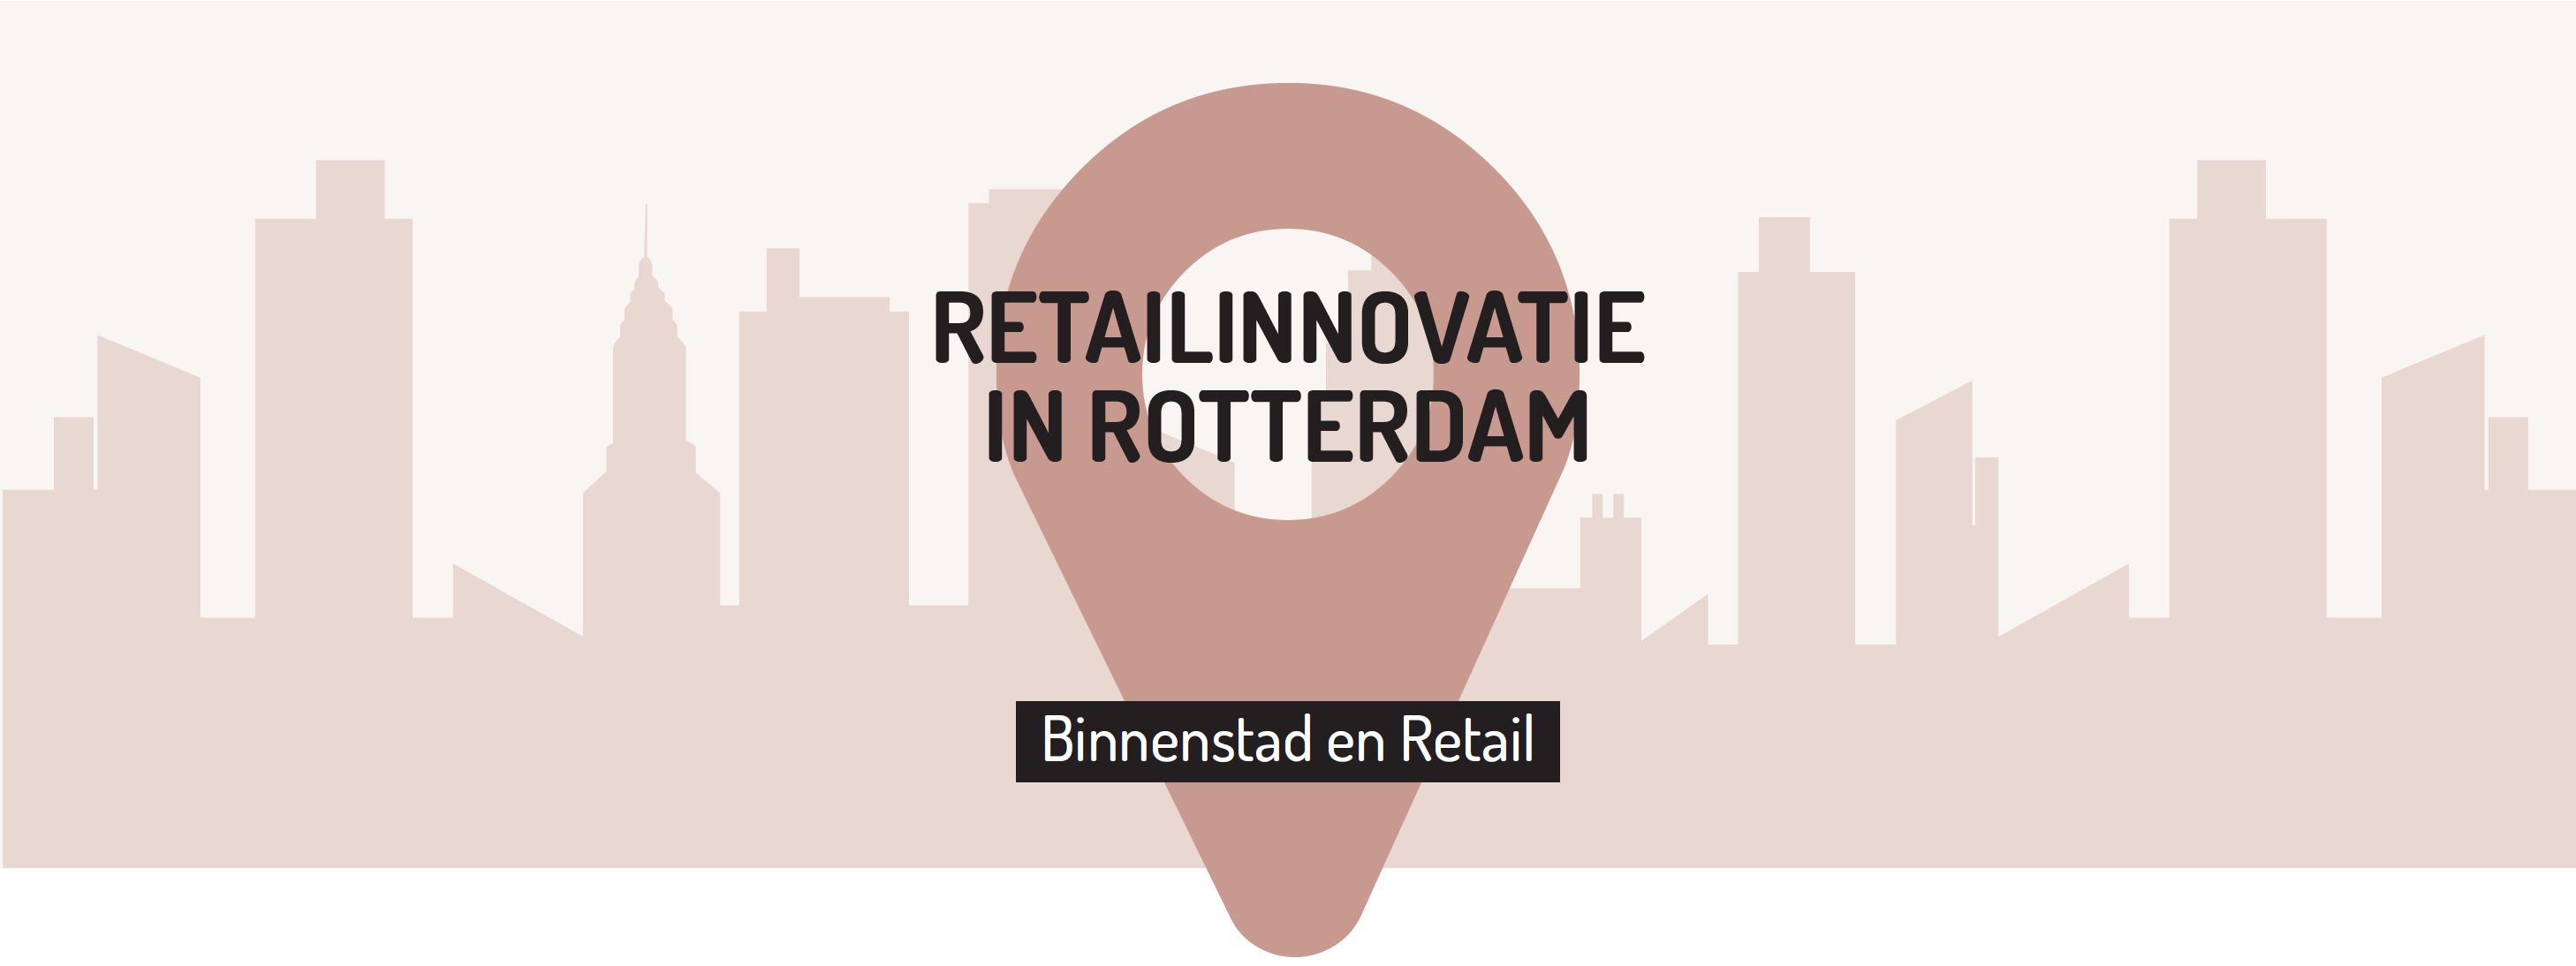 Retailinnovatie Rotterdam